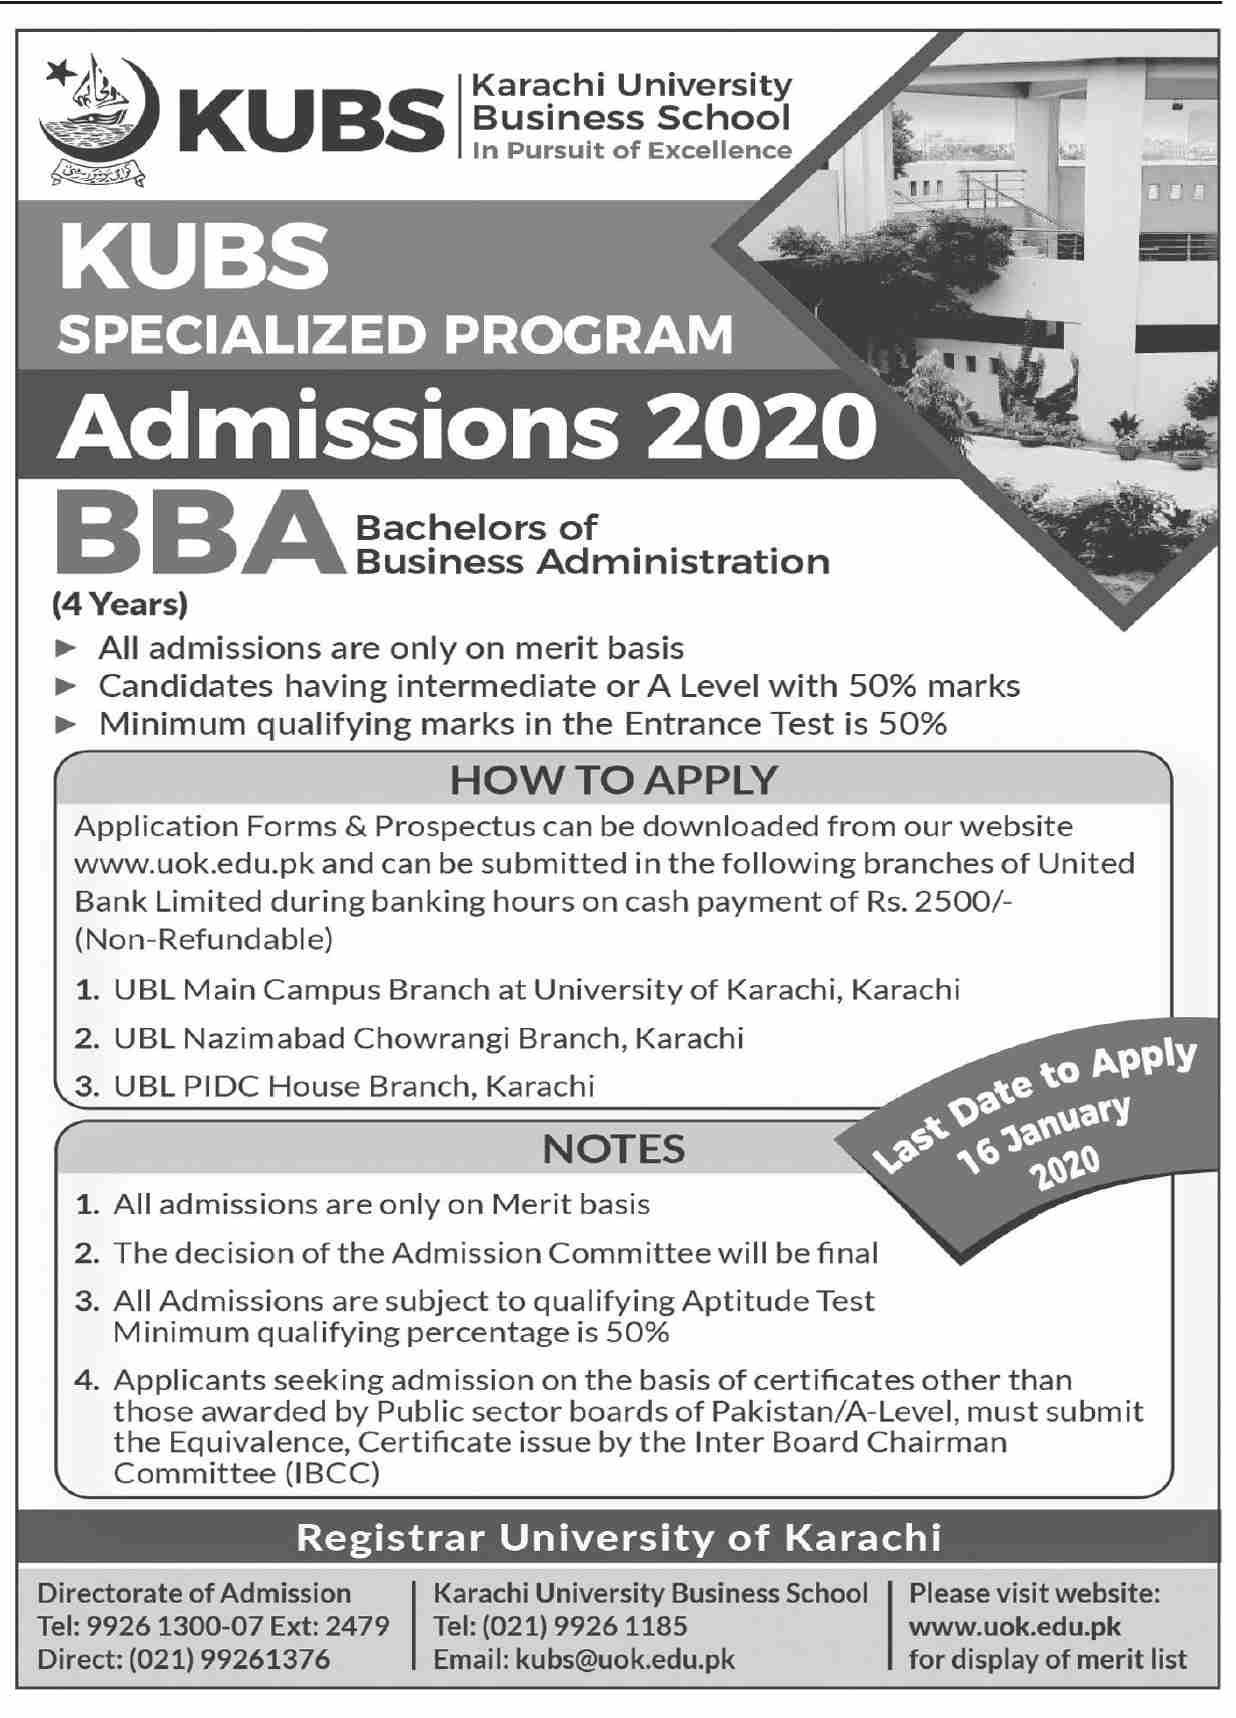 Karachi University Business School Karachi Admissions